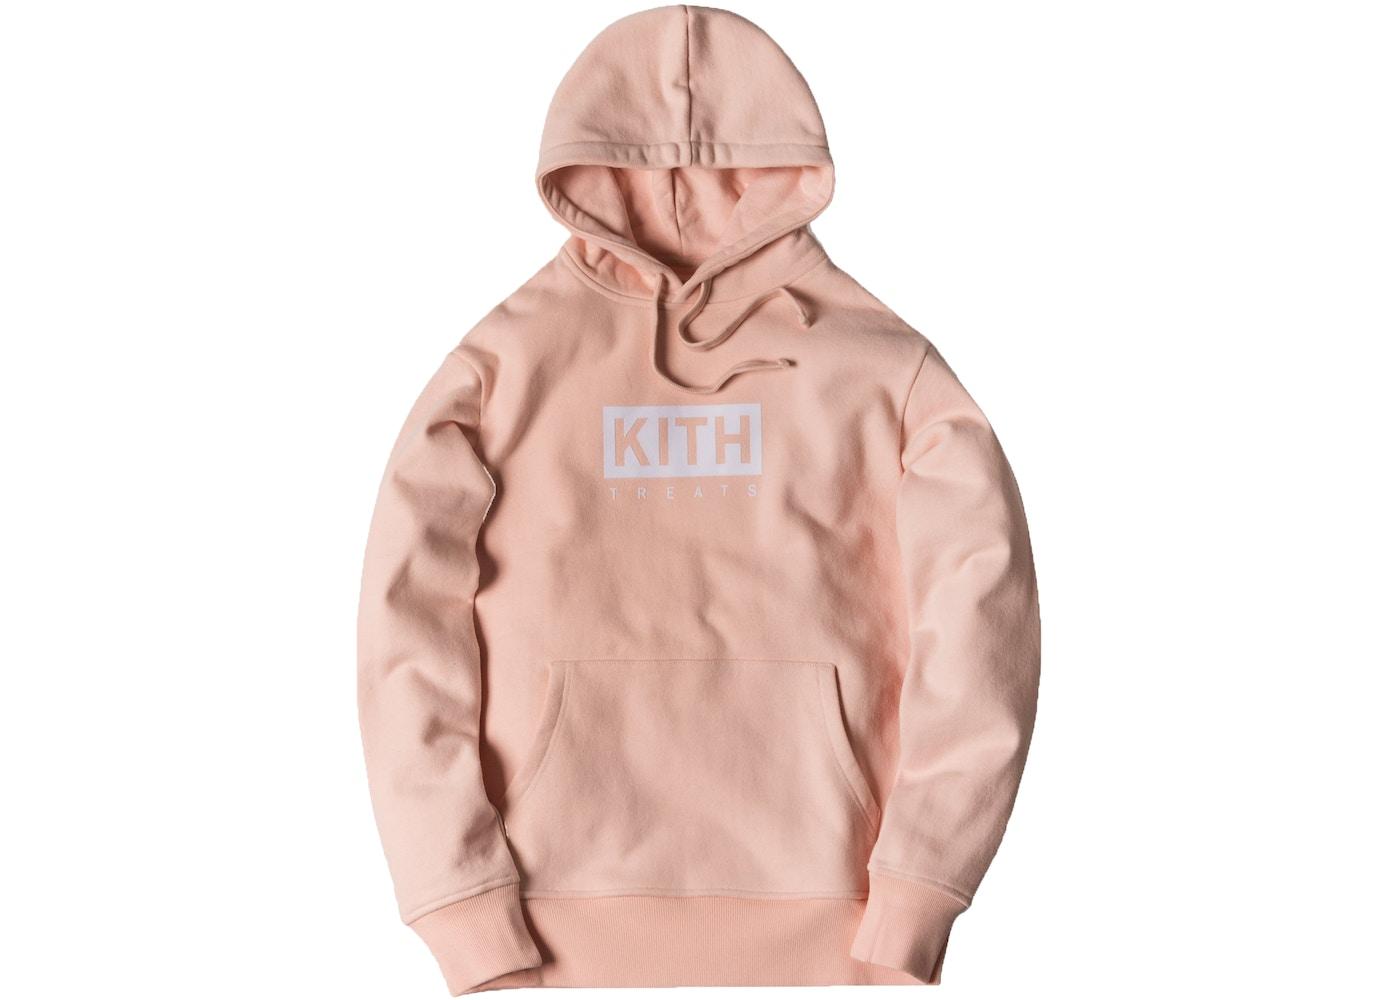 55b78b6d Kith Treats Hoodie Pink - SS17